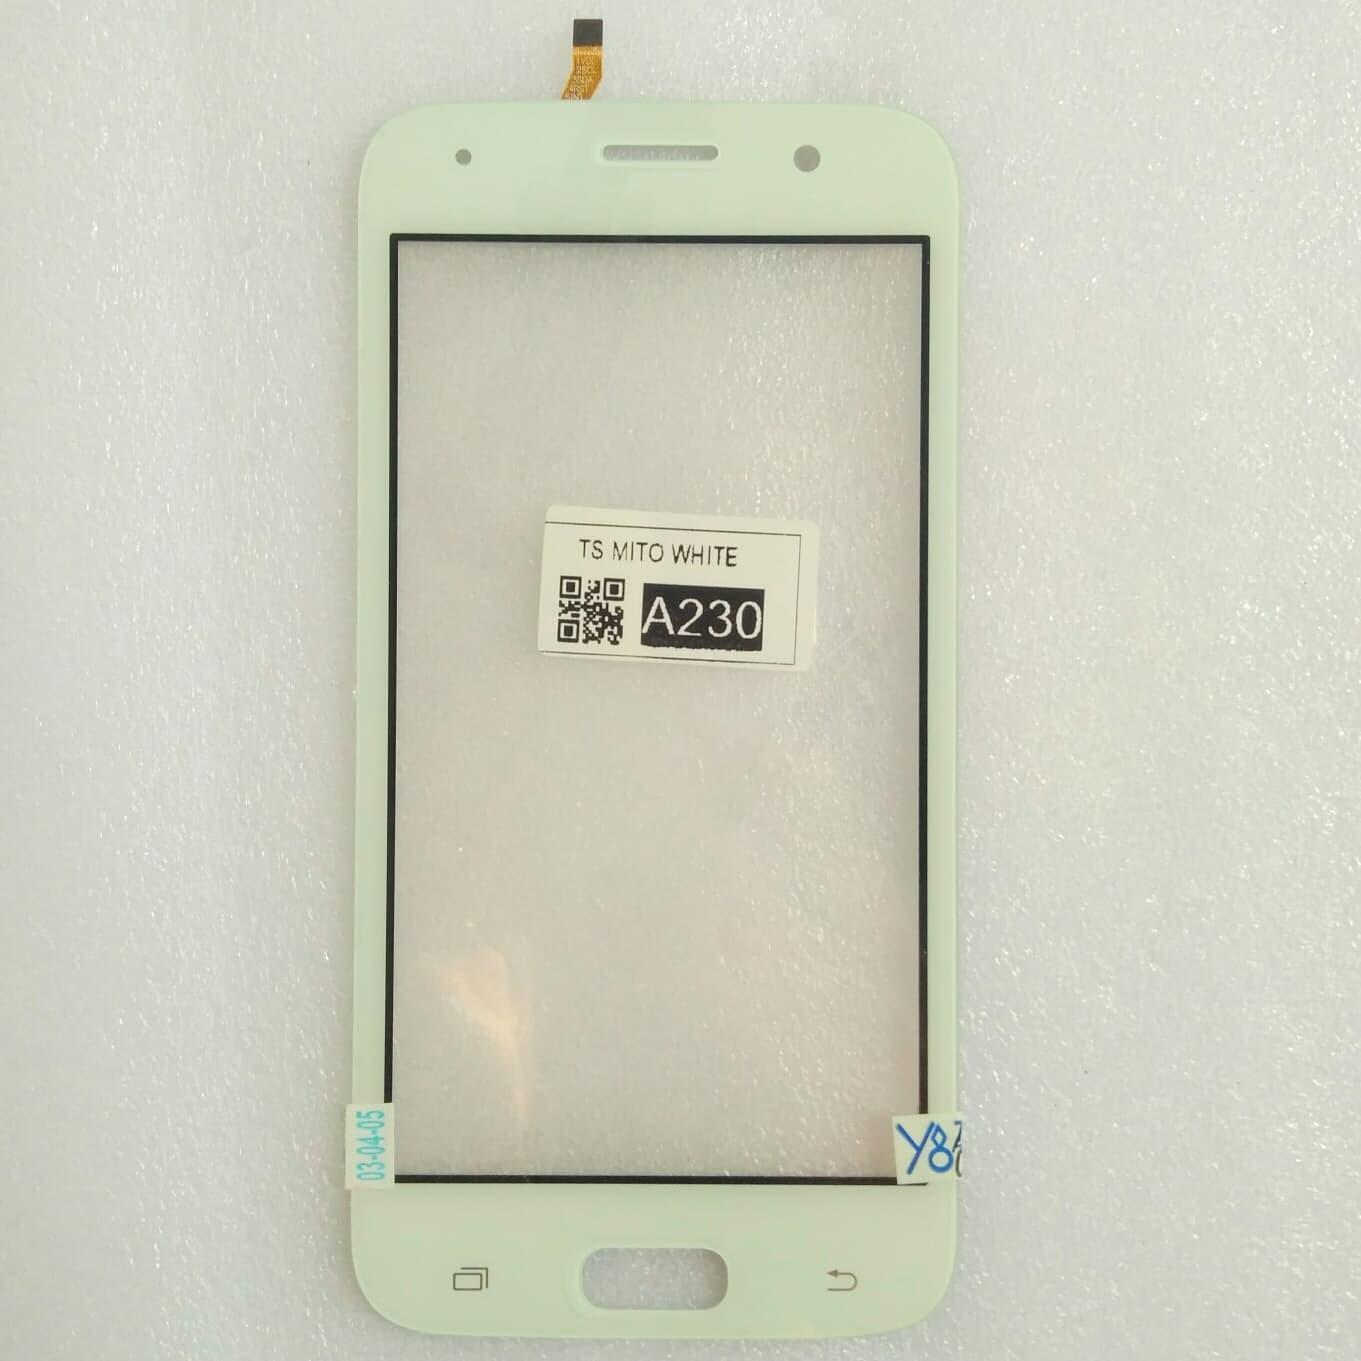 Touchscreen Ts Mito A120 Black Harga Terkini Dan Terlengkap Fantasy A99 Android Jellybean A230 Genzatronik